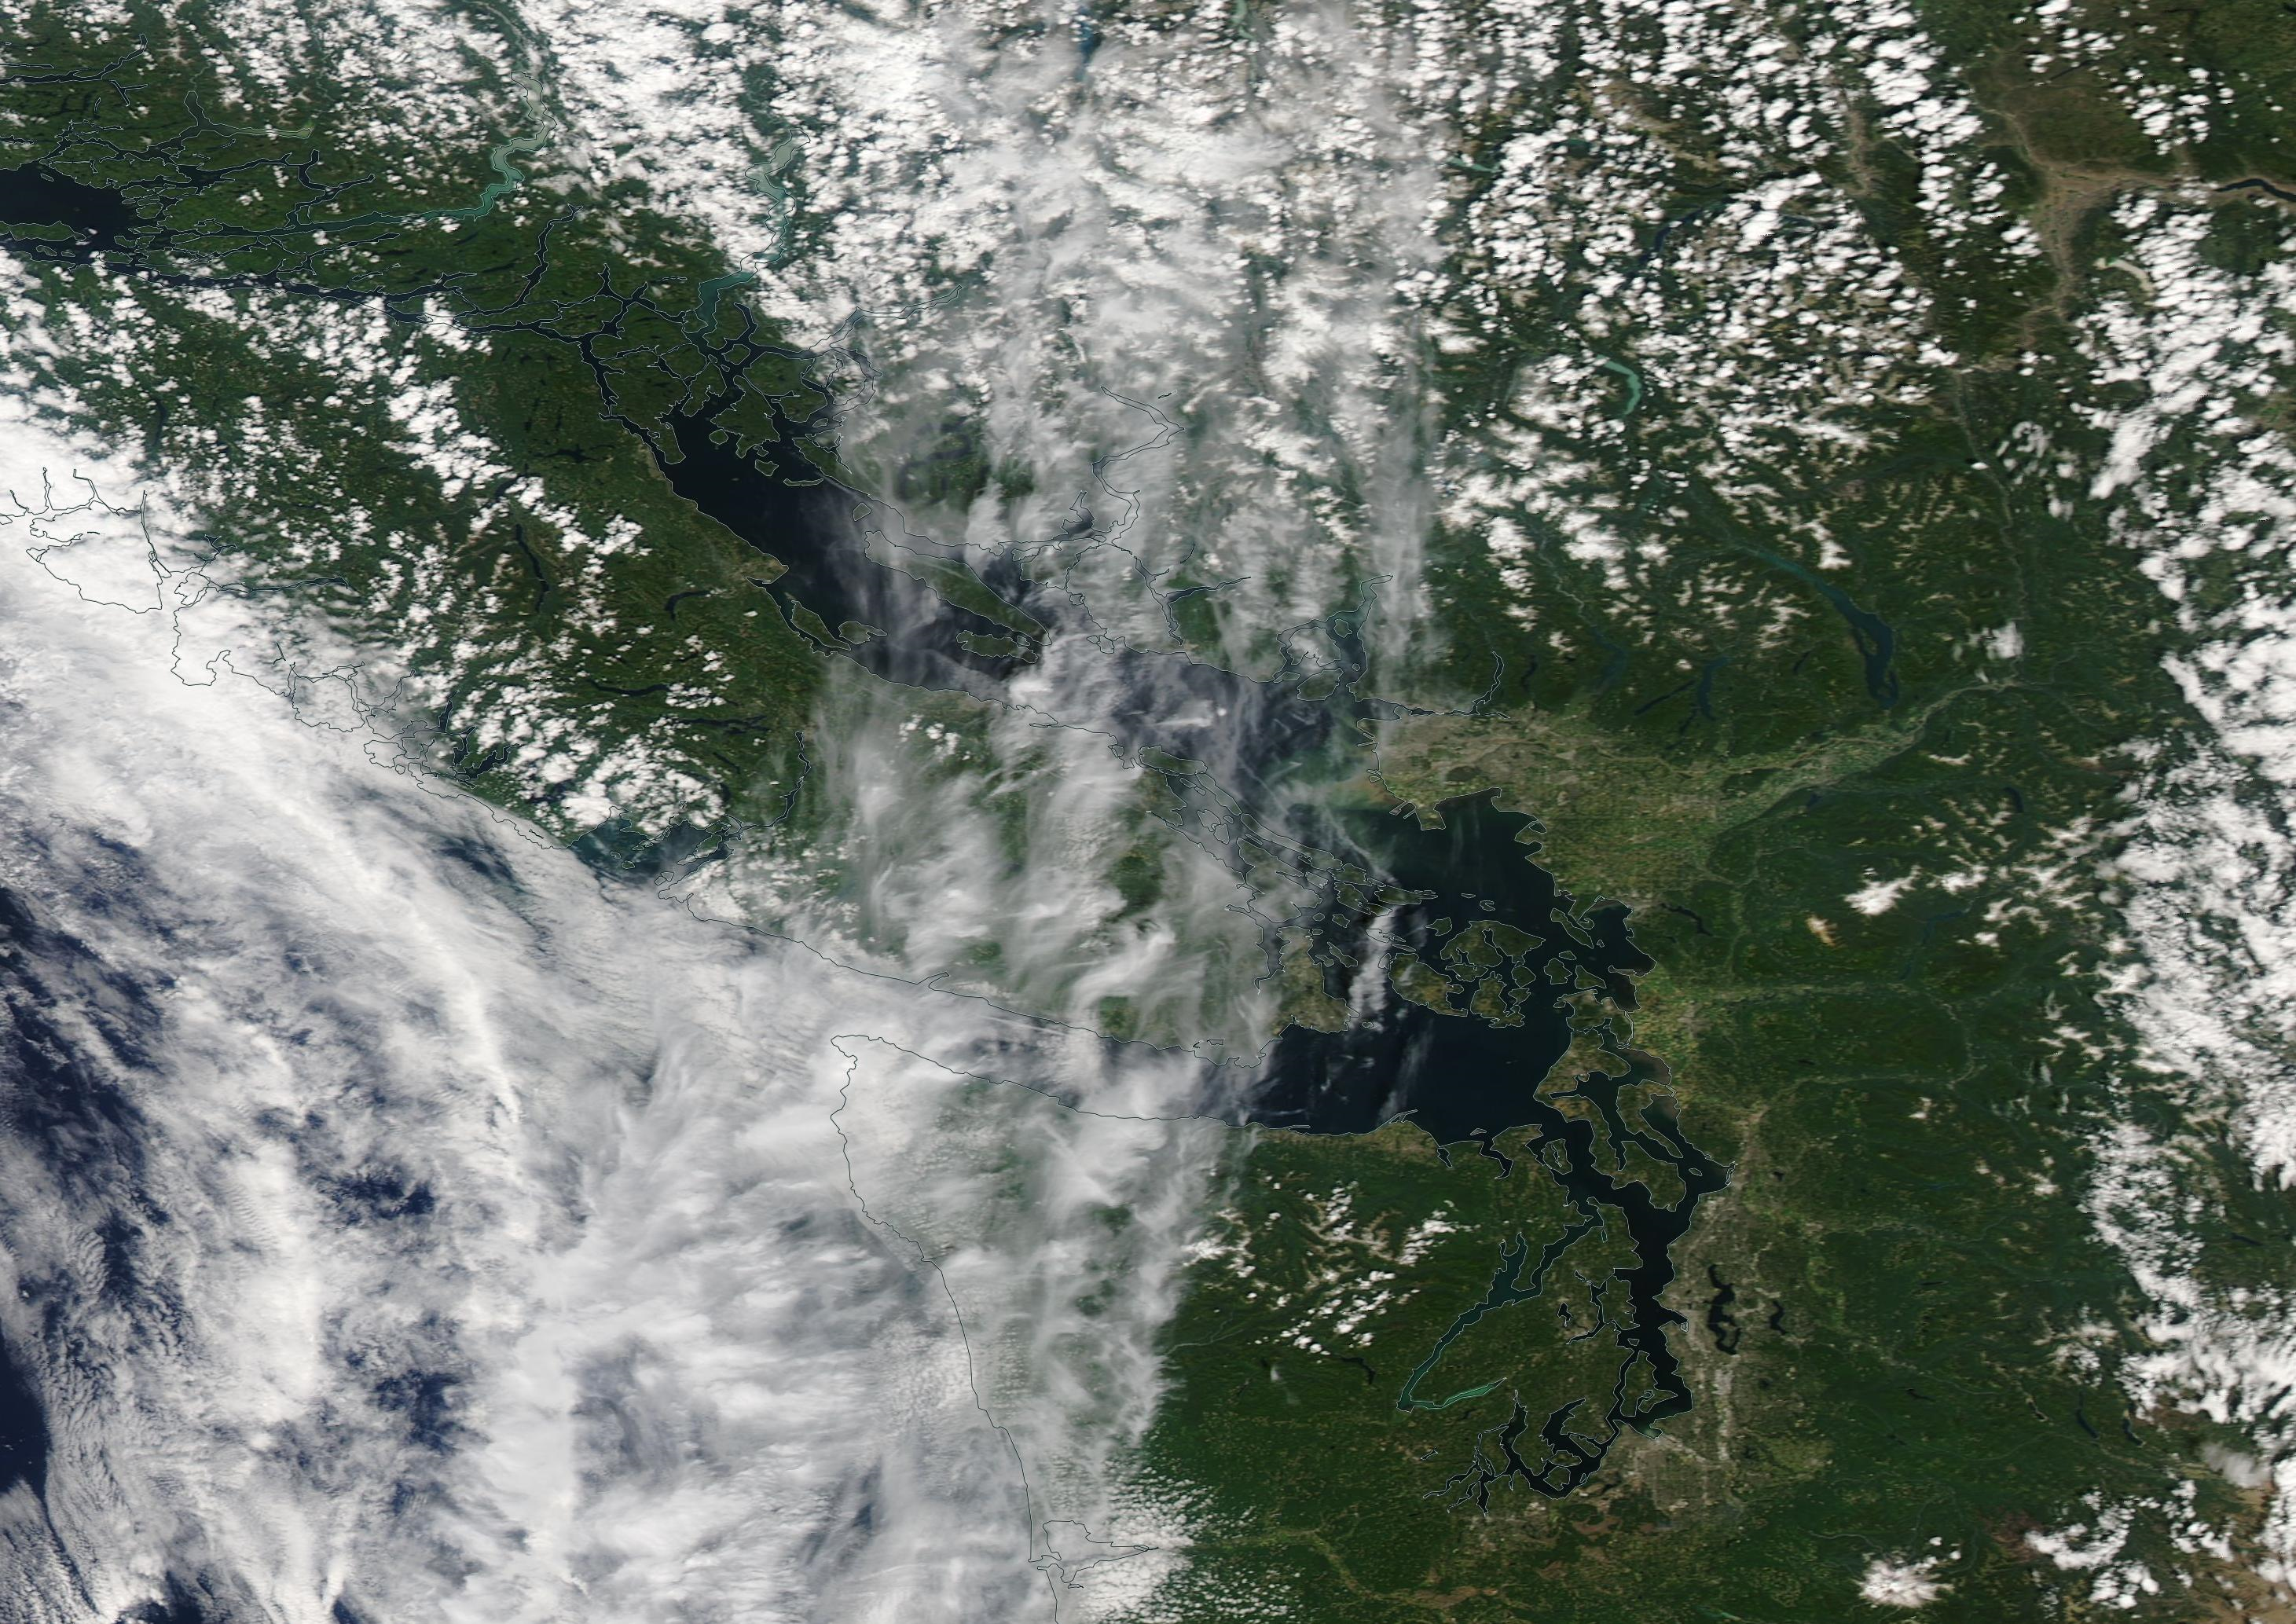 Vancouver Island chemtrail geoengineering Monday 22 July 2019 using Aqua / Modis base layer